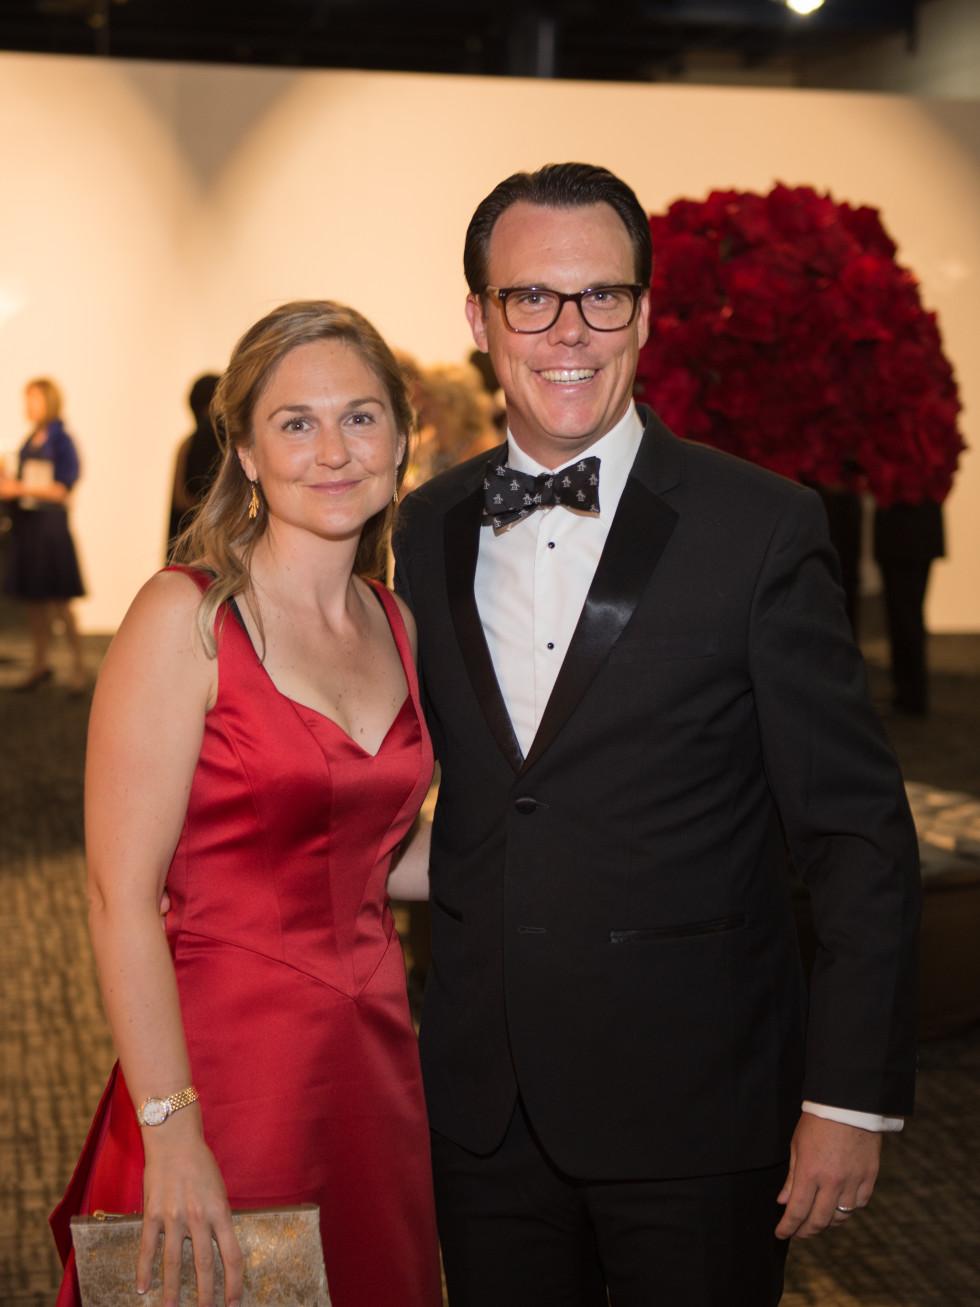 Katherine Thomasson and Michael Talbot at Houston Grand Opera opening night 2017